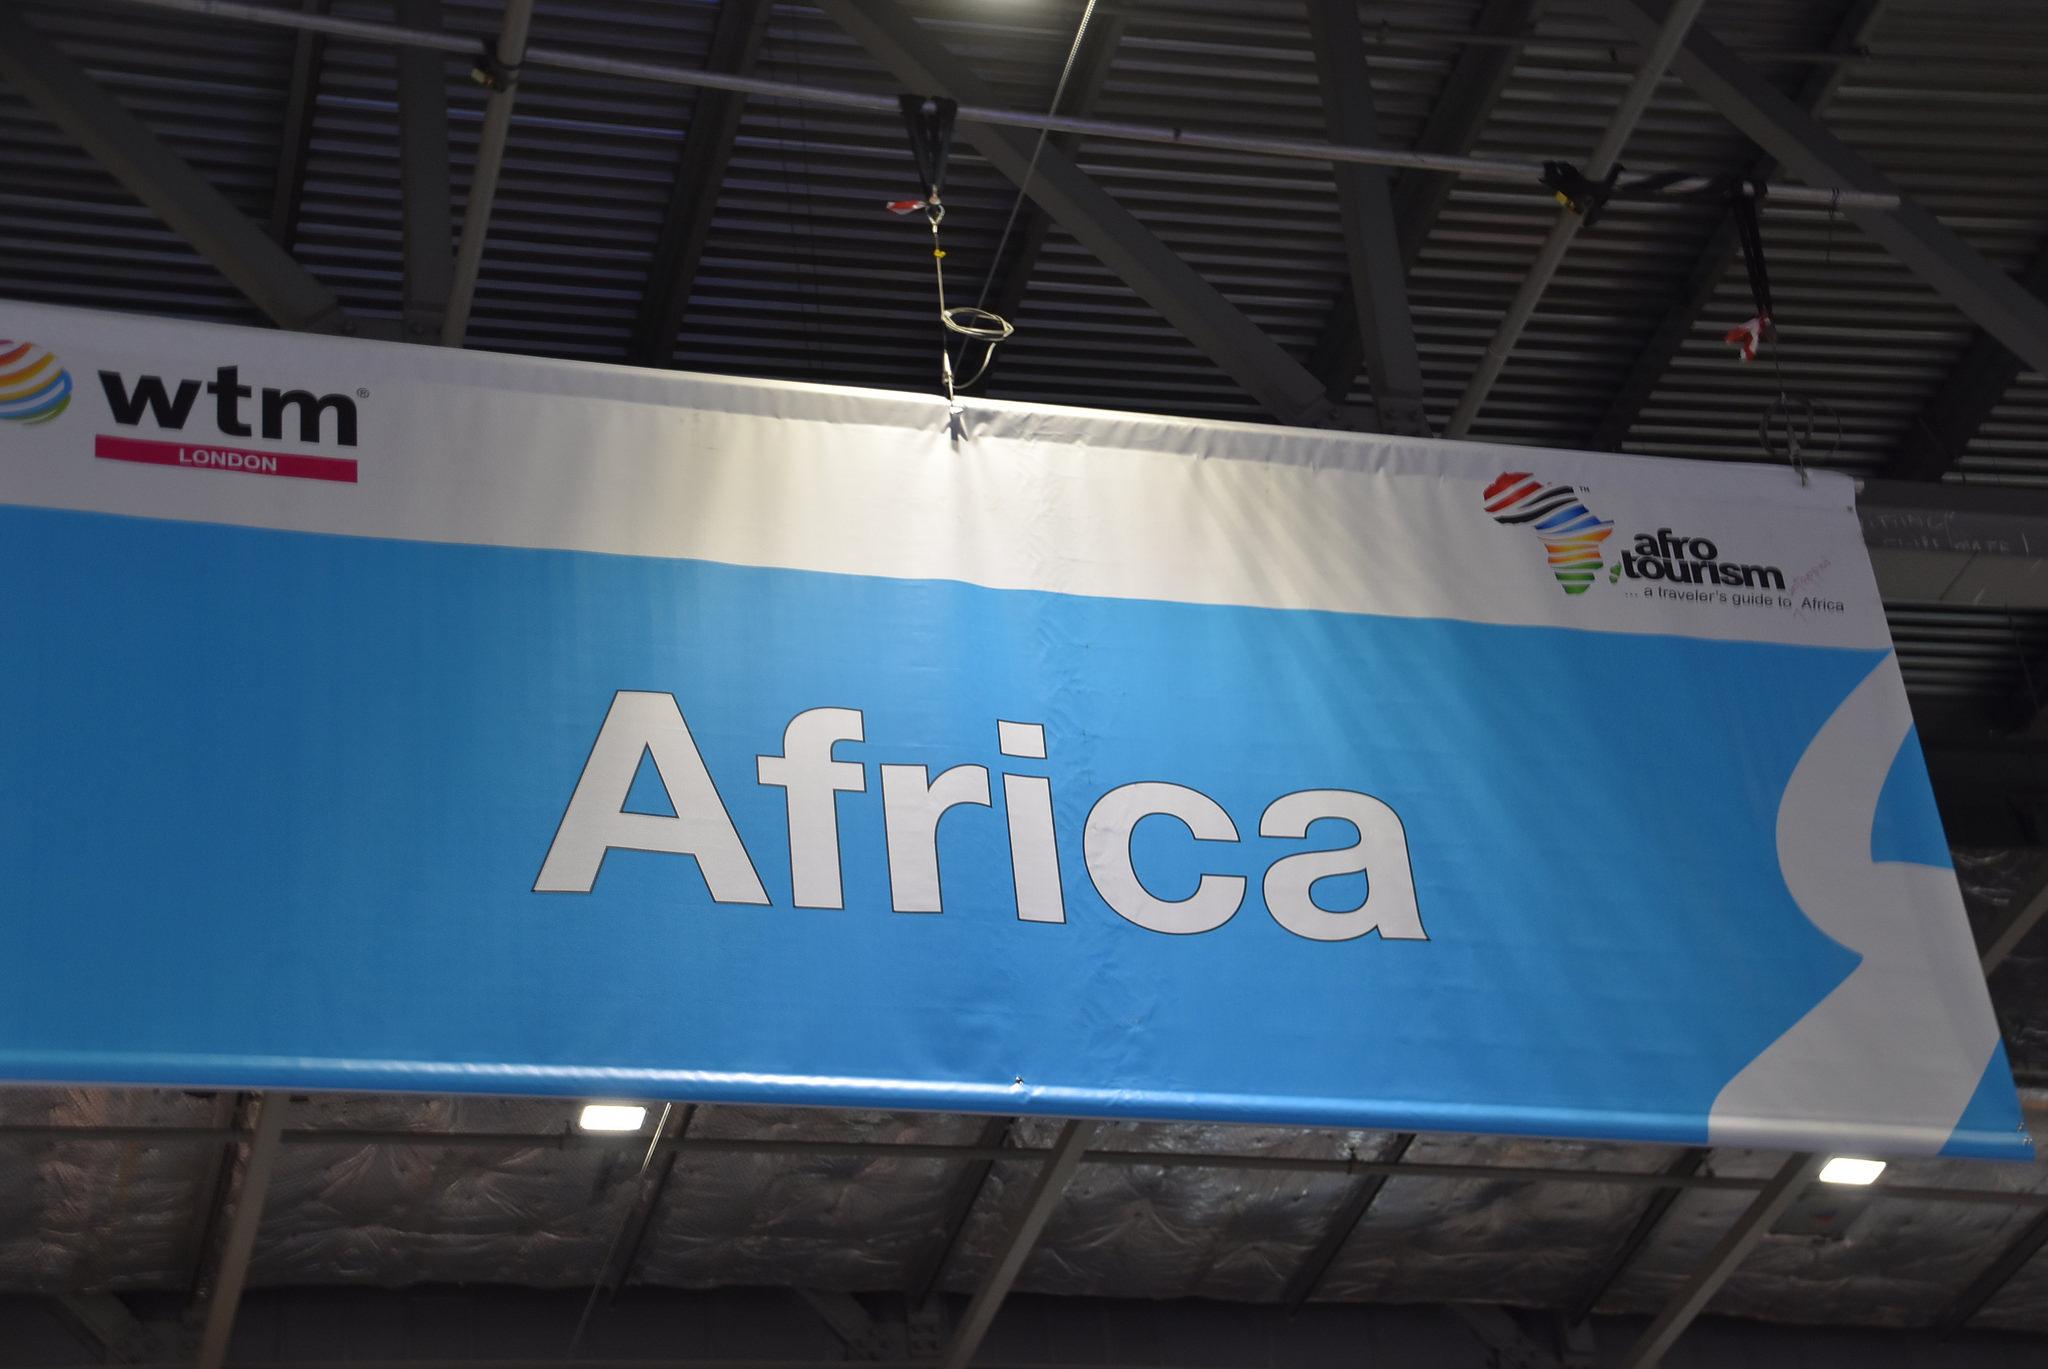 #VAWTM2017: Africa embraces the idea of open borders